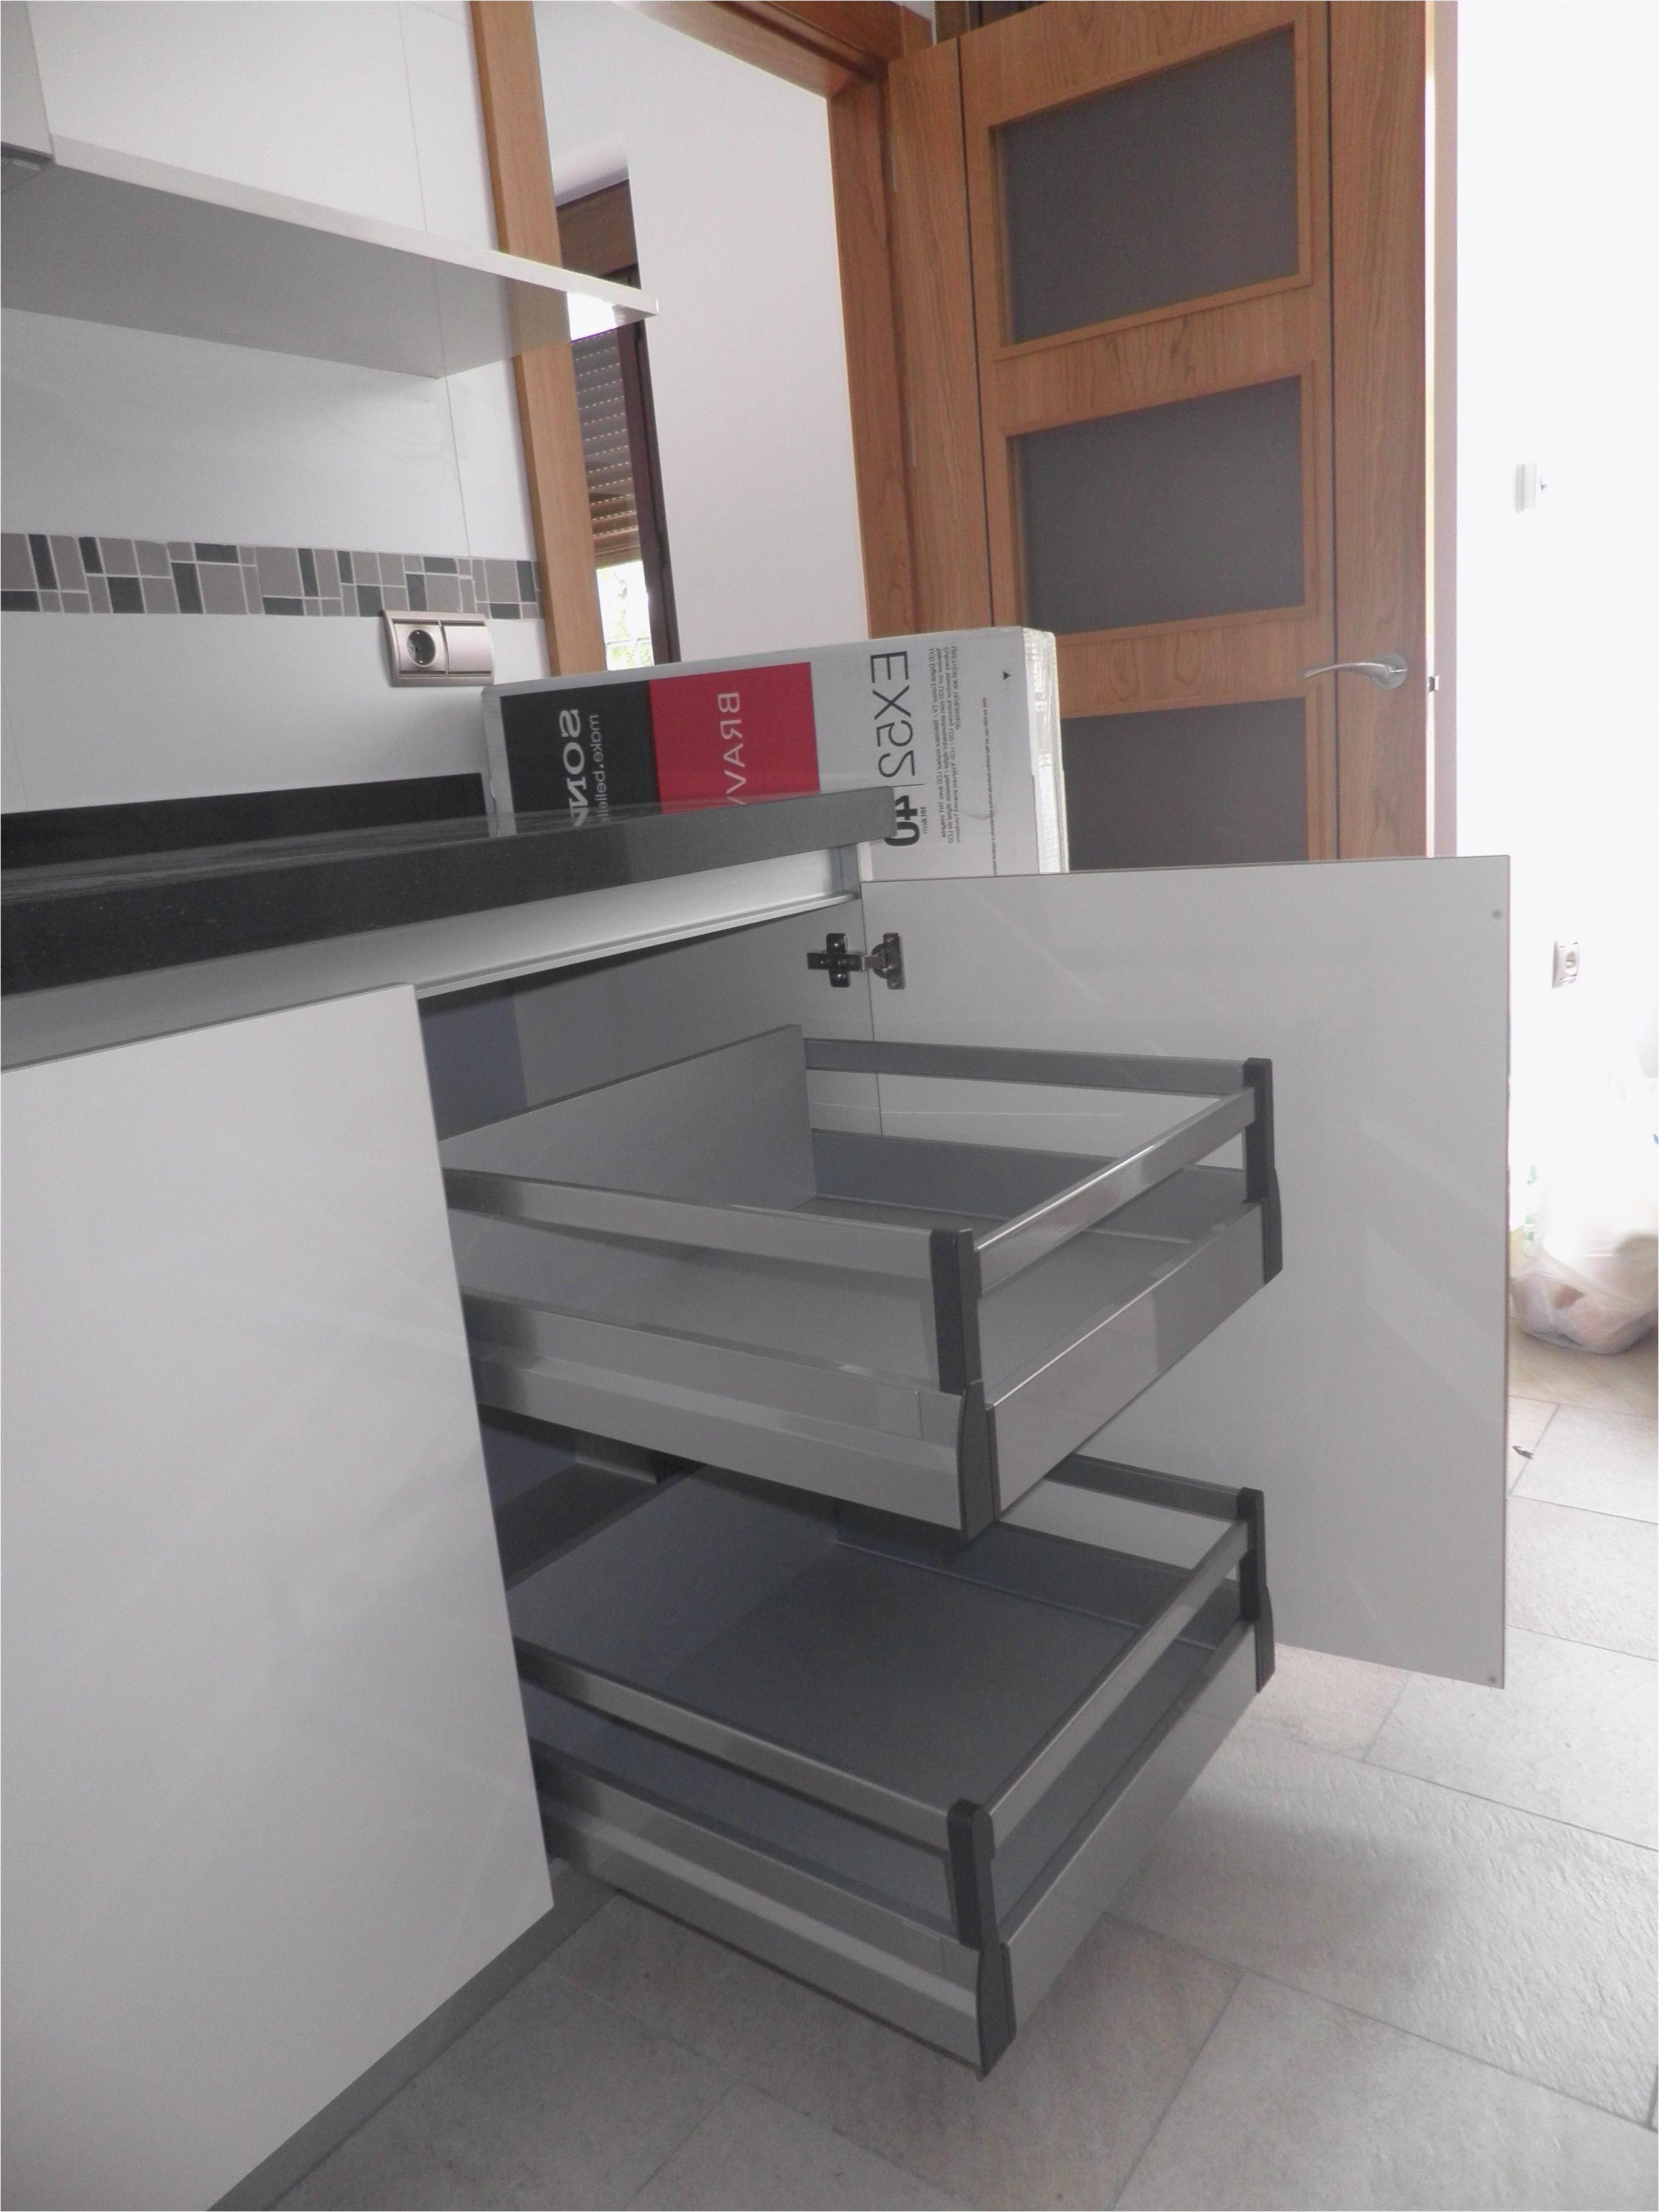 Programa Diseño Muebles 3d Gratis Whdr Inicio Programa Diseà O Armarios Gratis Bogotaeslacumbre